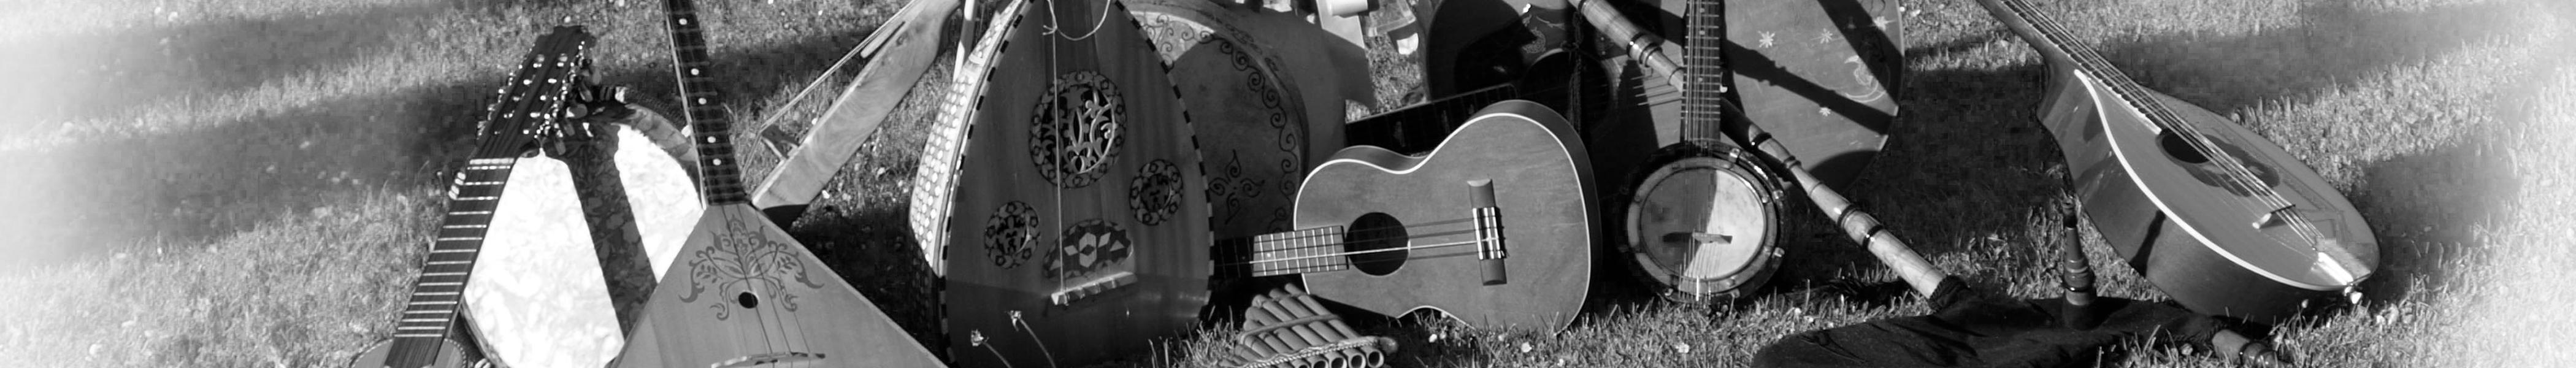 musicas-del-mundo-folk